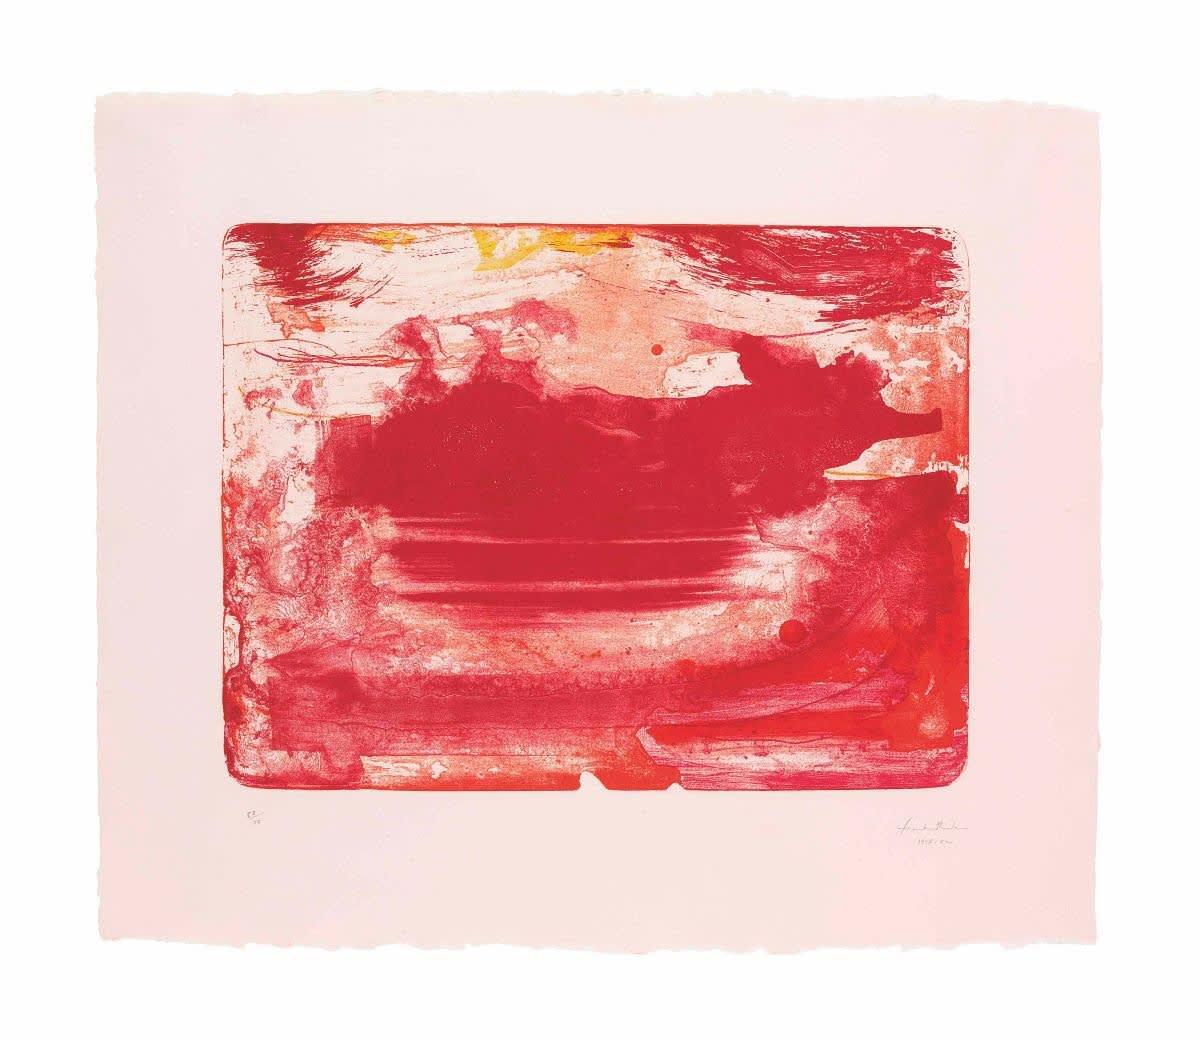 Helen Frankenthaler, The Red Sea, 1978